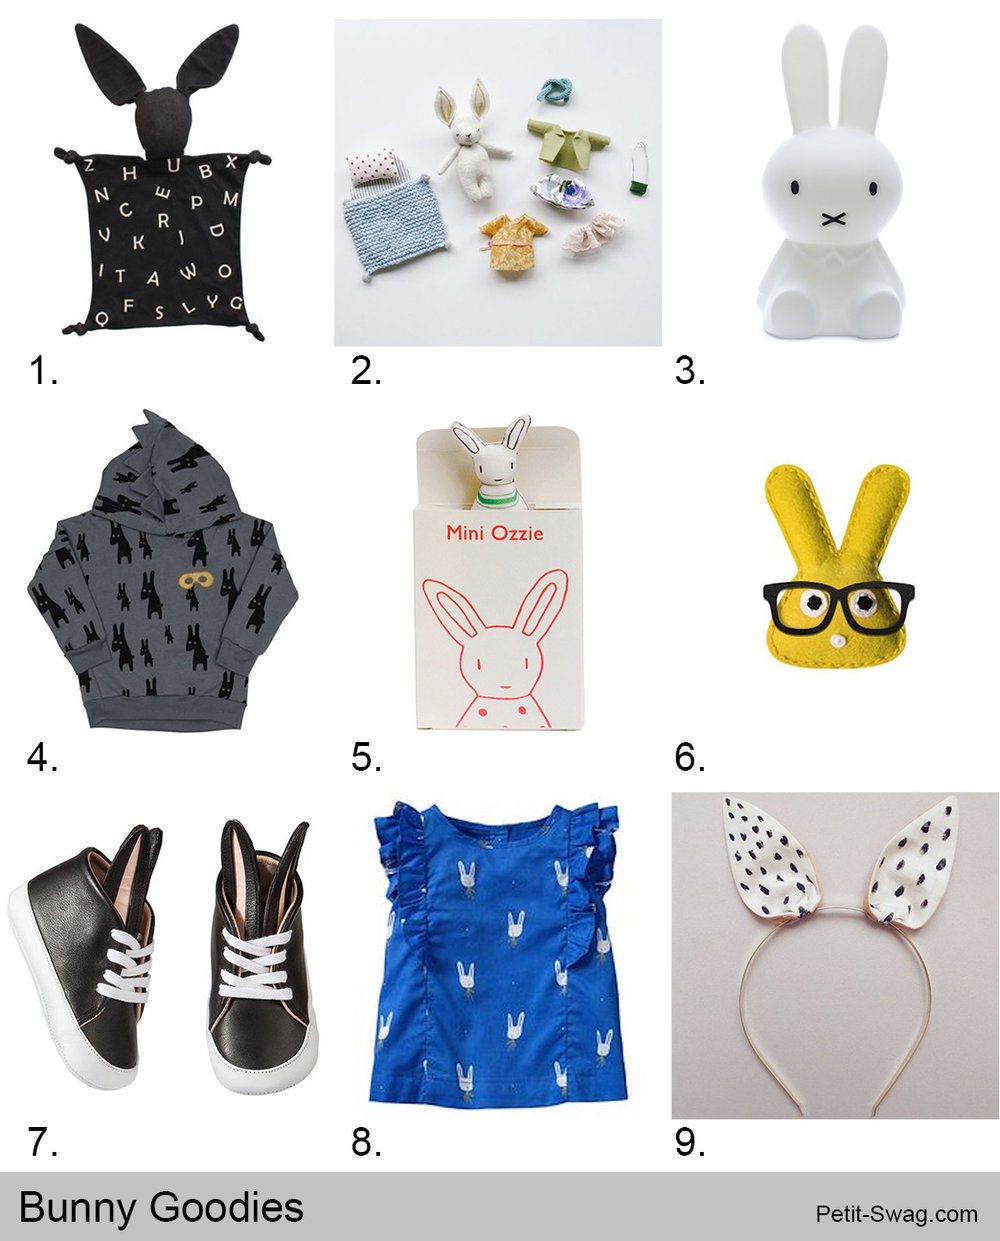 Bunny Goodies | Petit-Swag.com